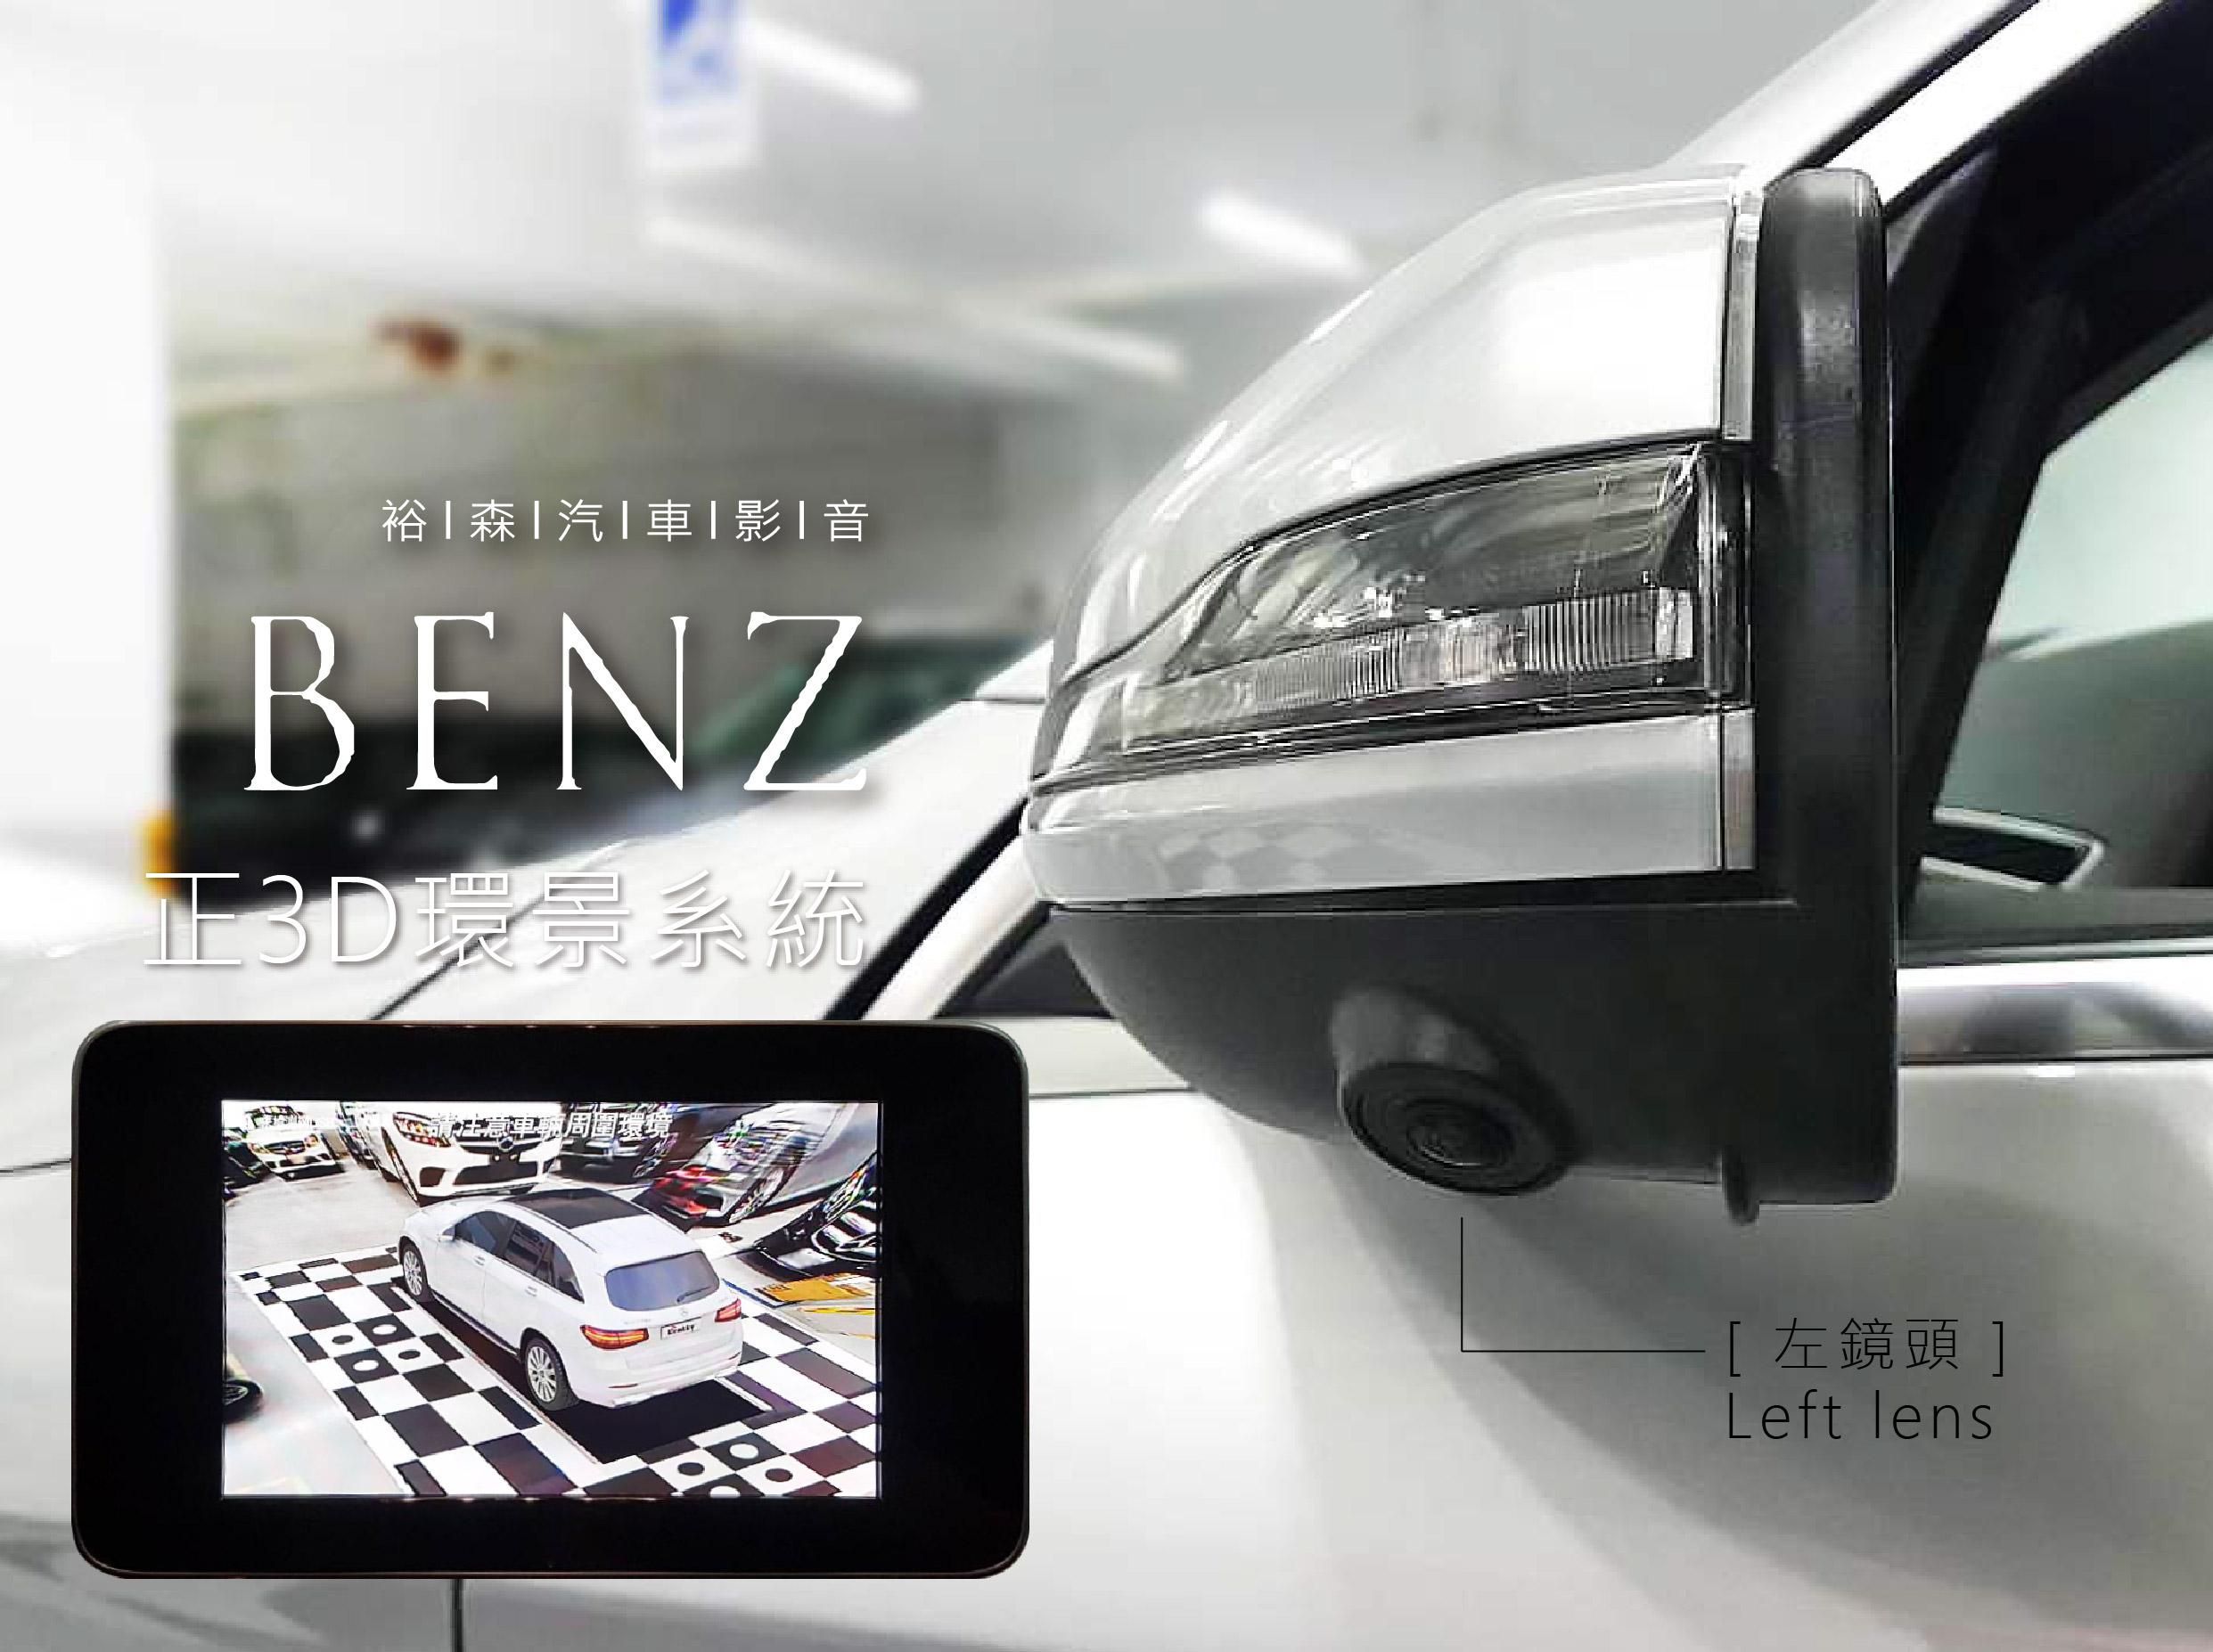 BENZ賓士 GLC 3D高清環景行車輔助系統:左鏡頭